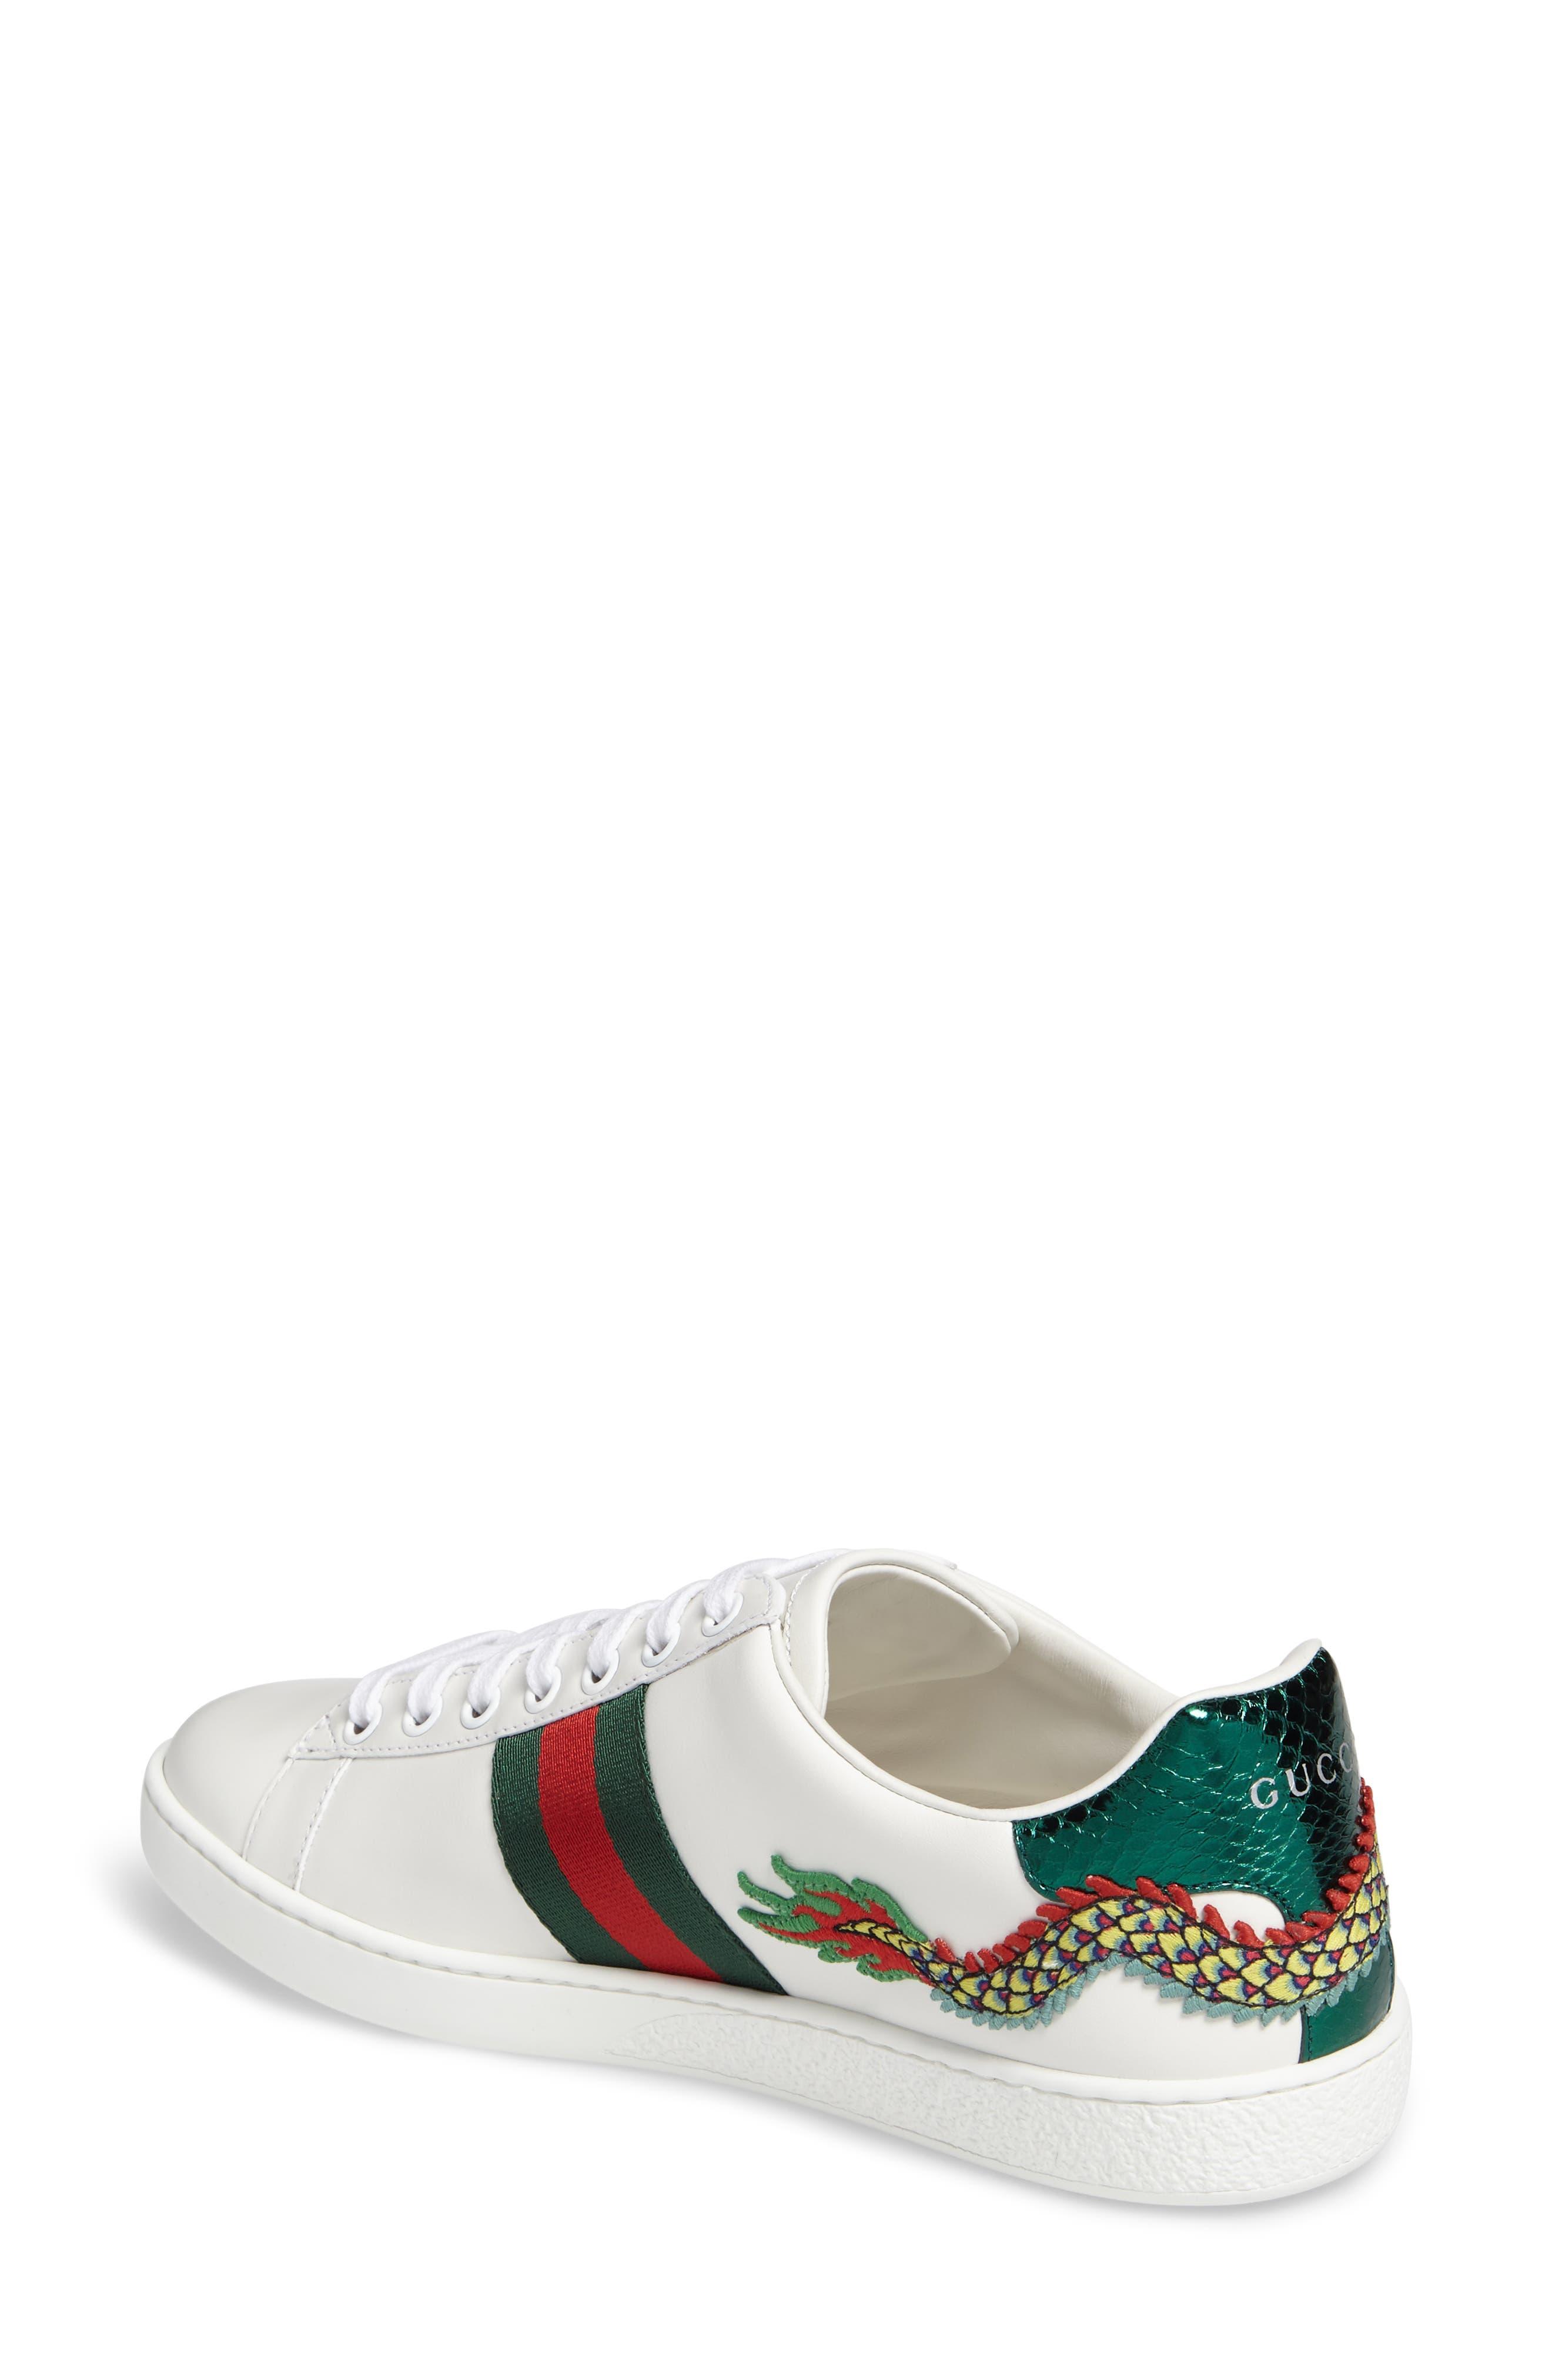 New Ace Dragon Sneaker,                             Alternate thumbnail 2, color,                             138